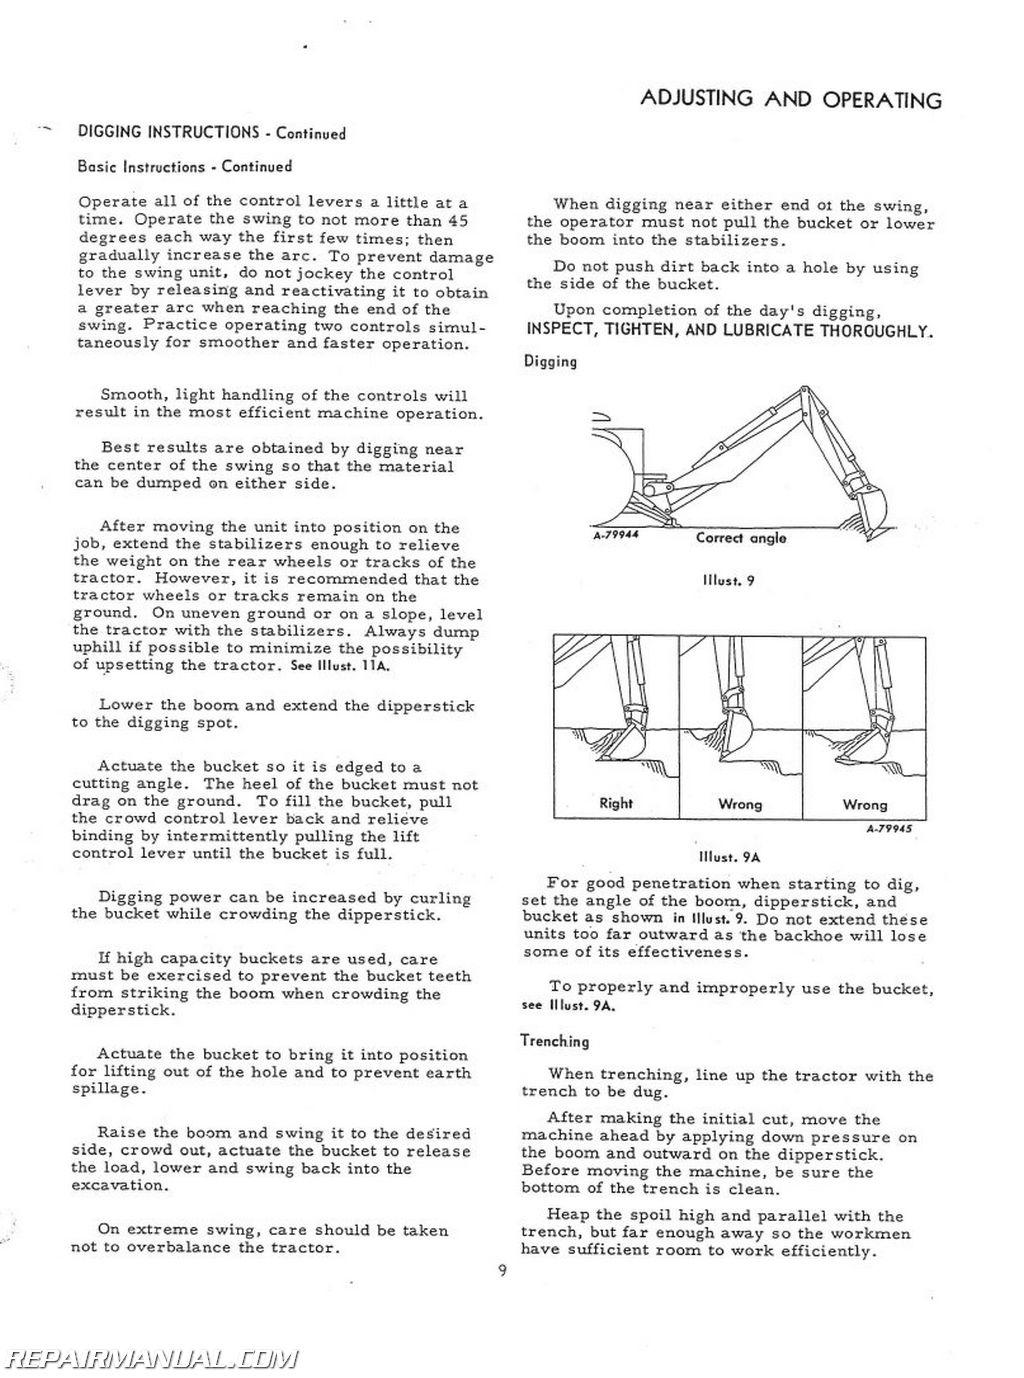 International Harvester Backhoe Attachment Operators Manual